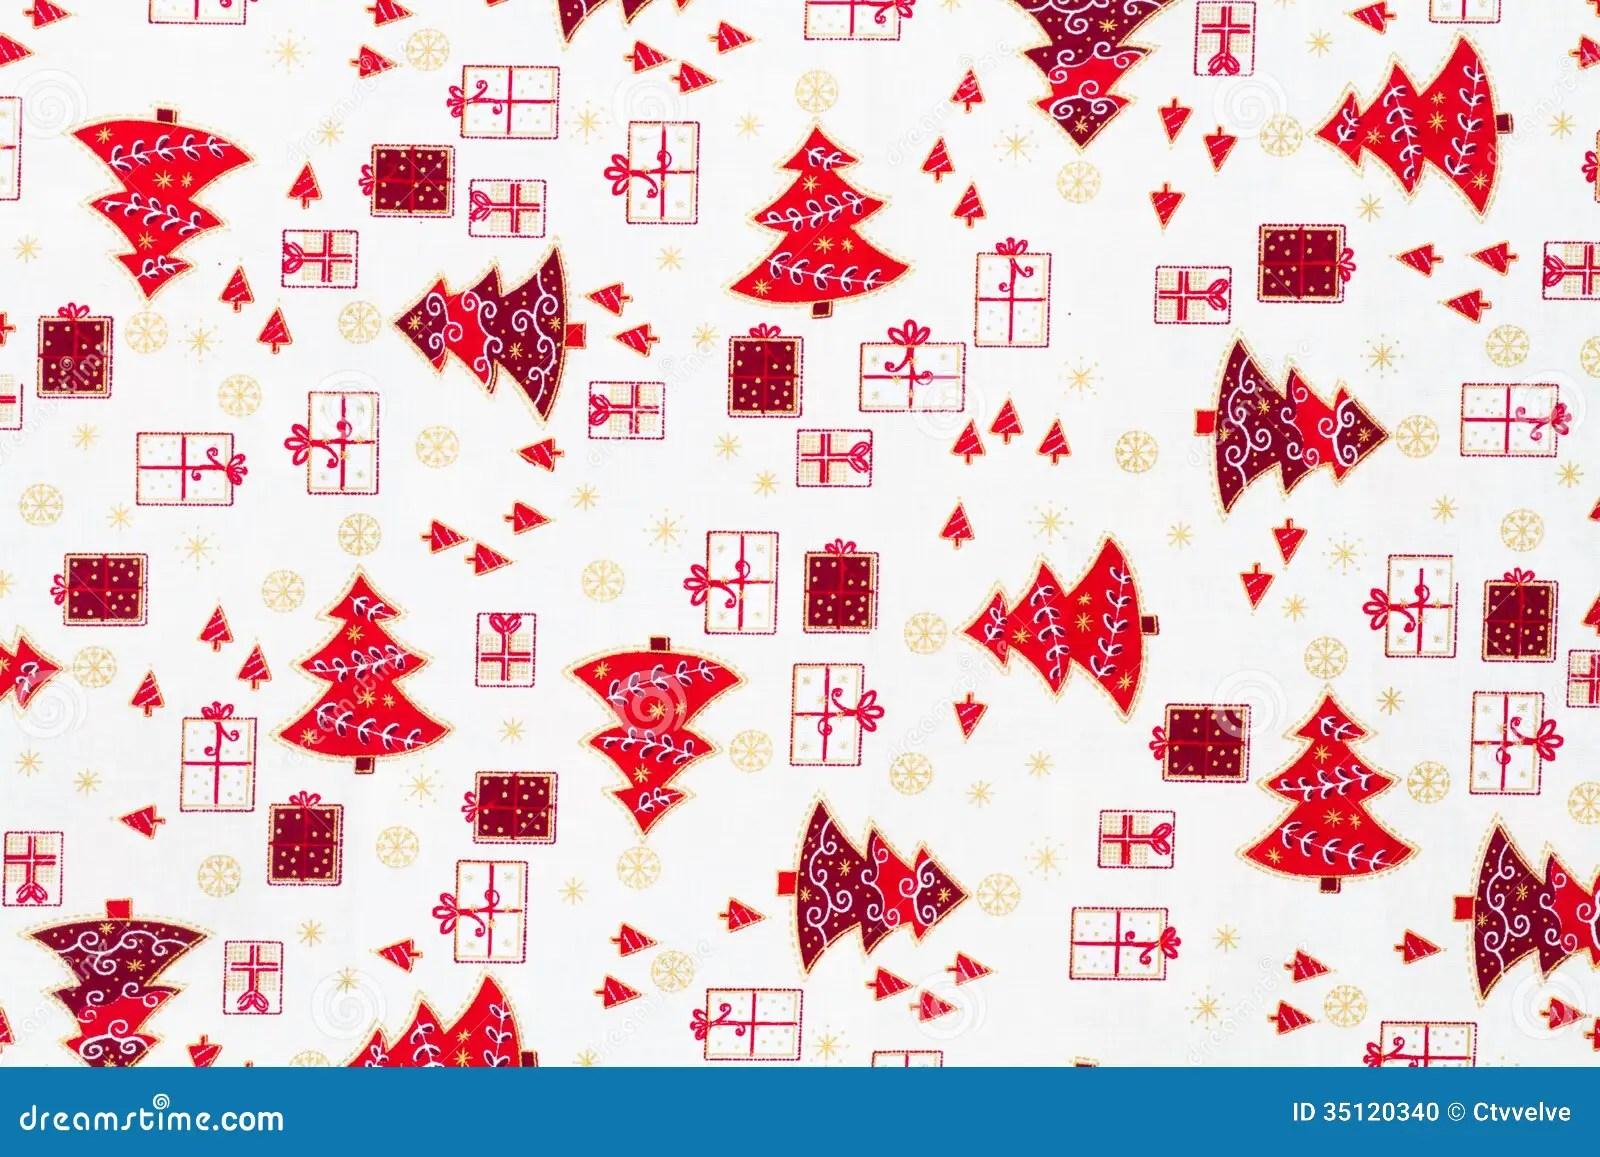 Reindeer Wallpaper Cute 与圣诞节元素的包装纸。 库存例证 插画 包括有 纸张 叶子 圣诞节 装饰 例证 现有量 要素